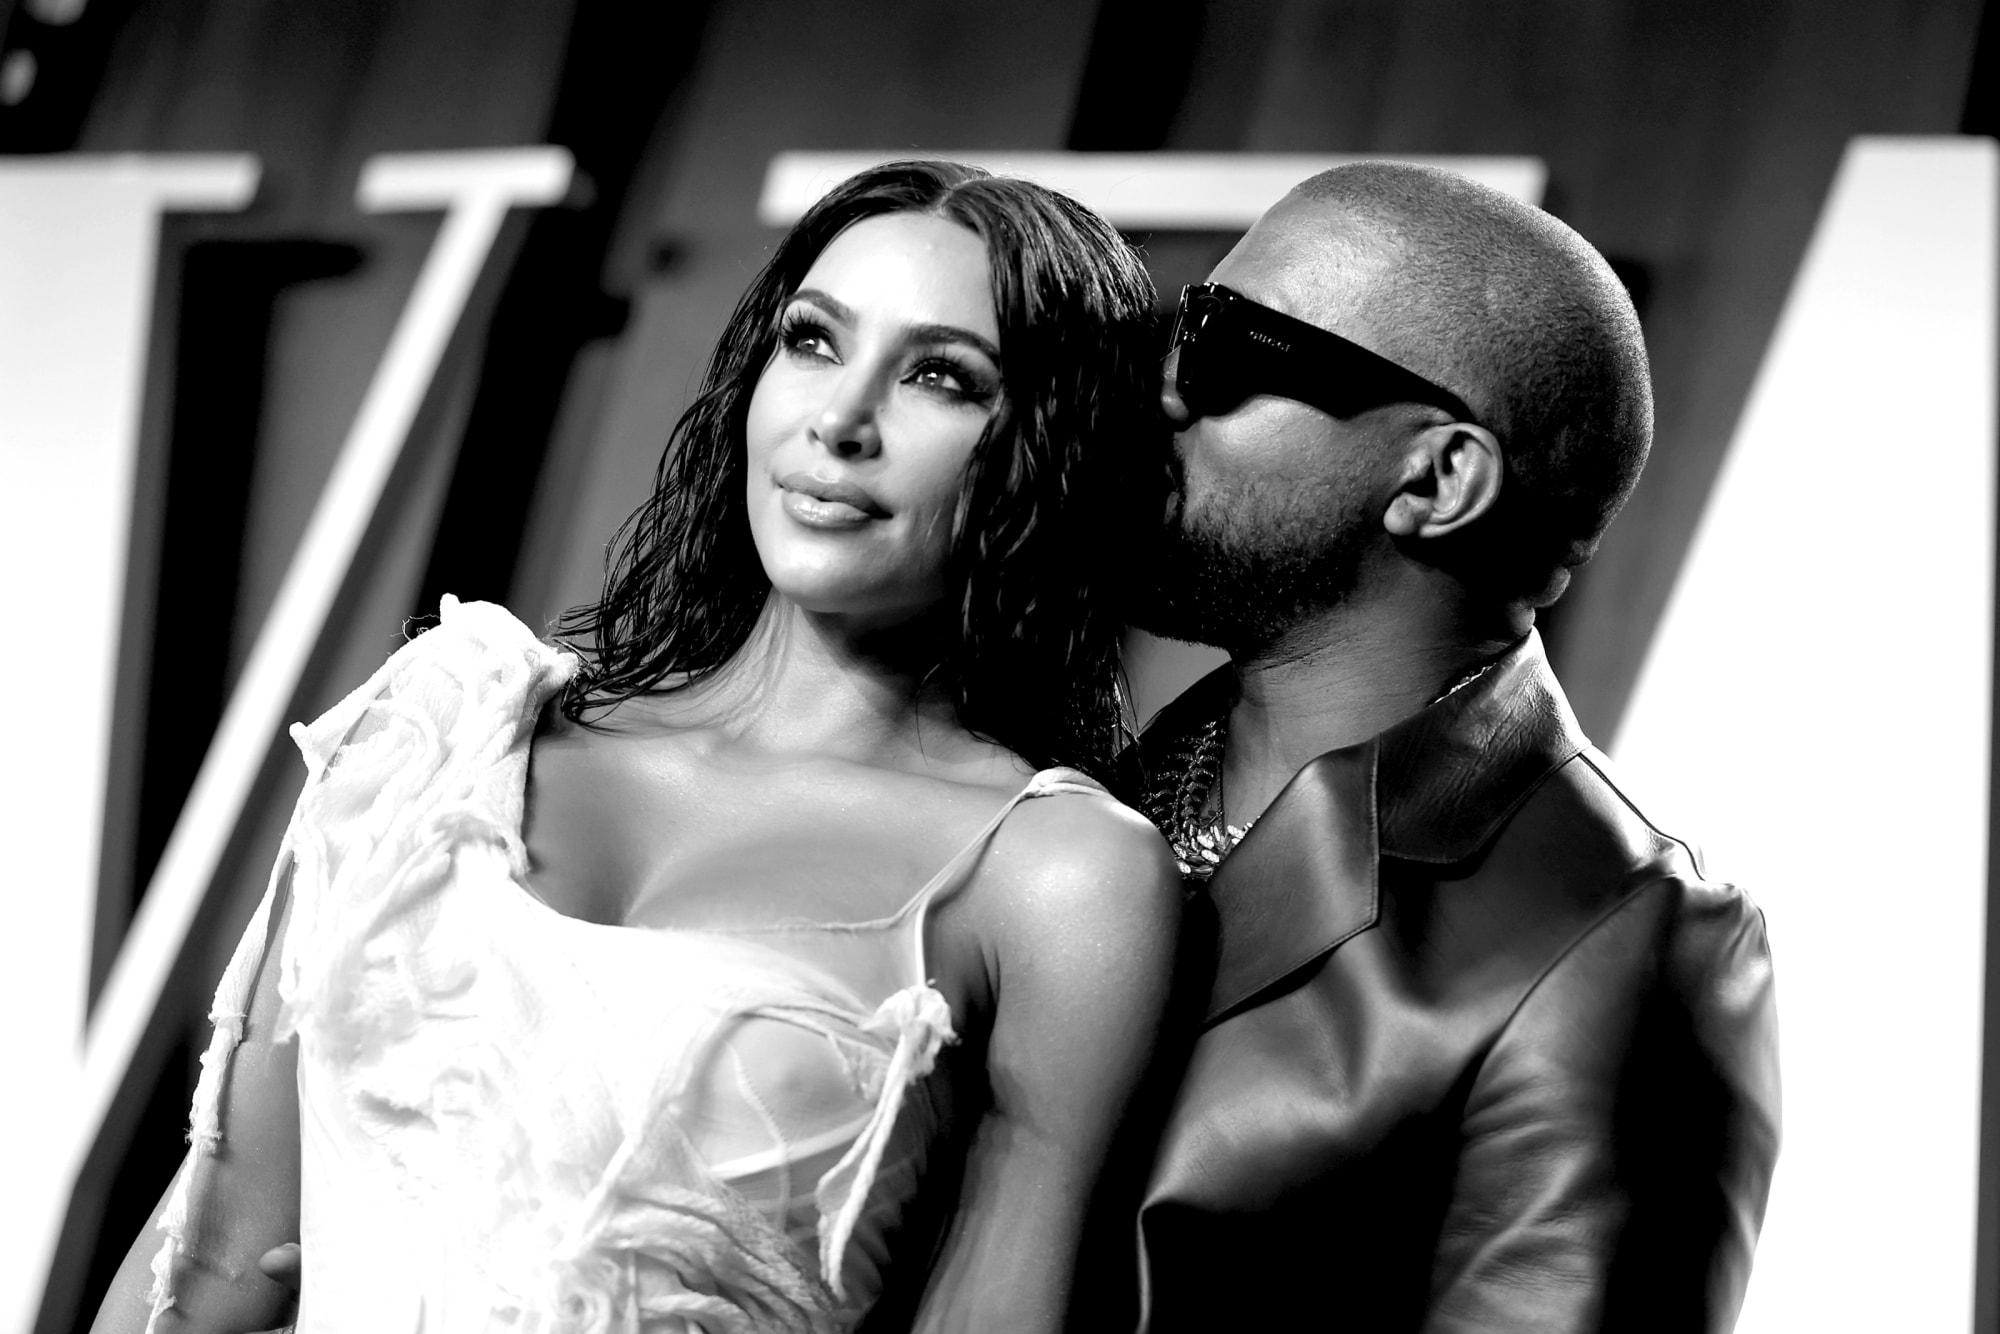 Kim Kardashian wants 'more communication' with Kanye West [Report]